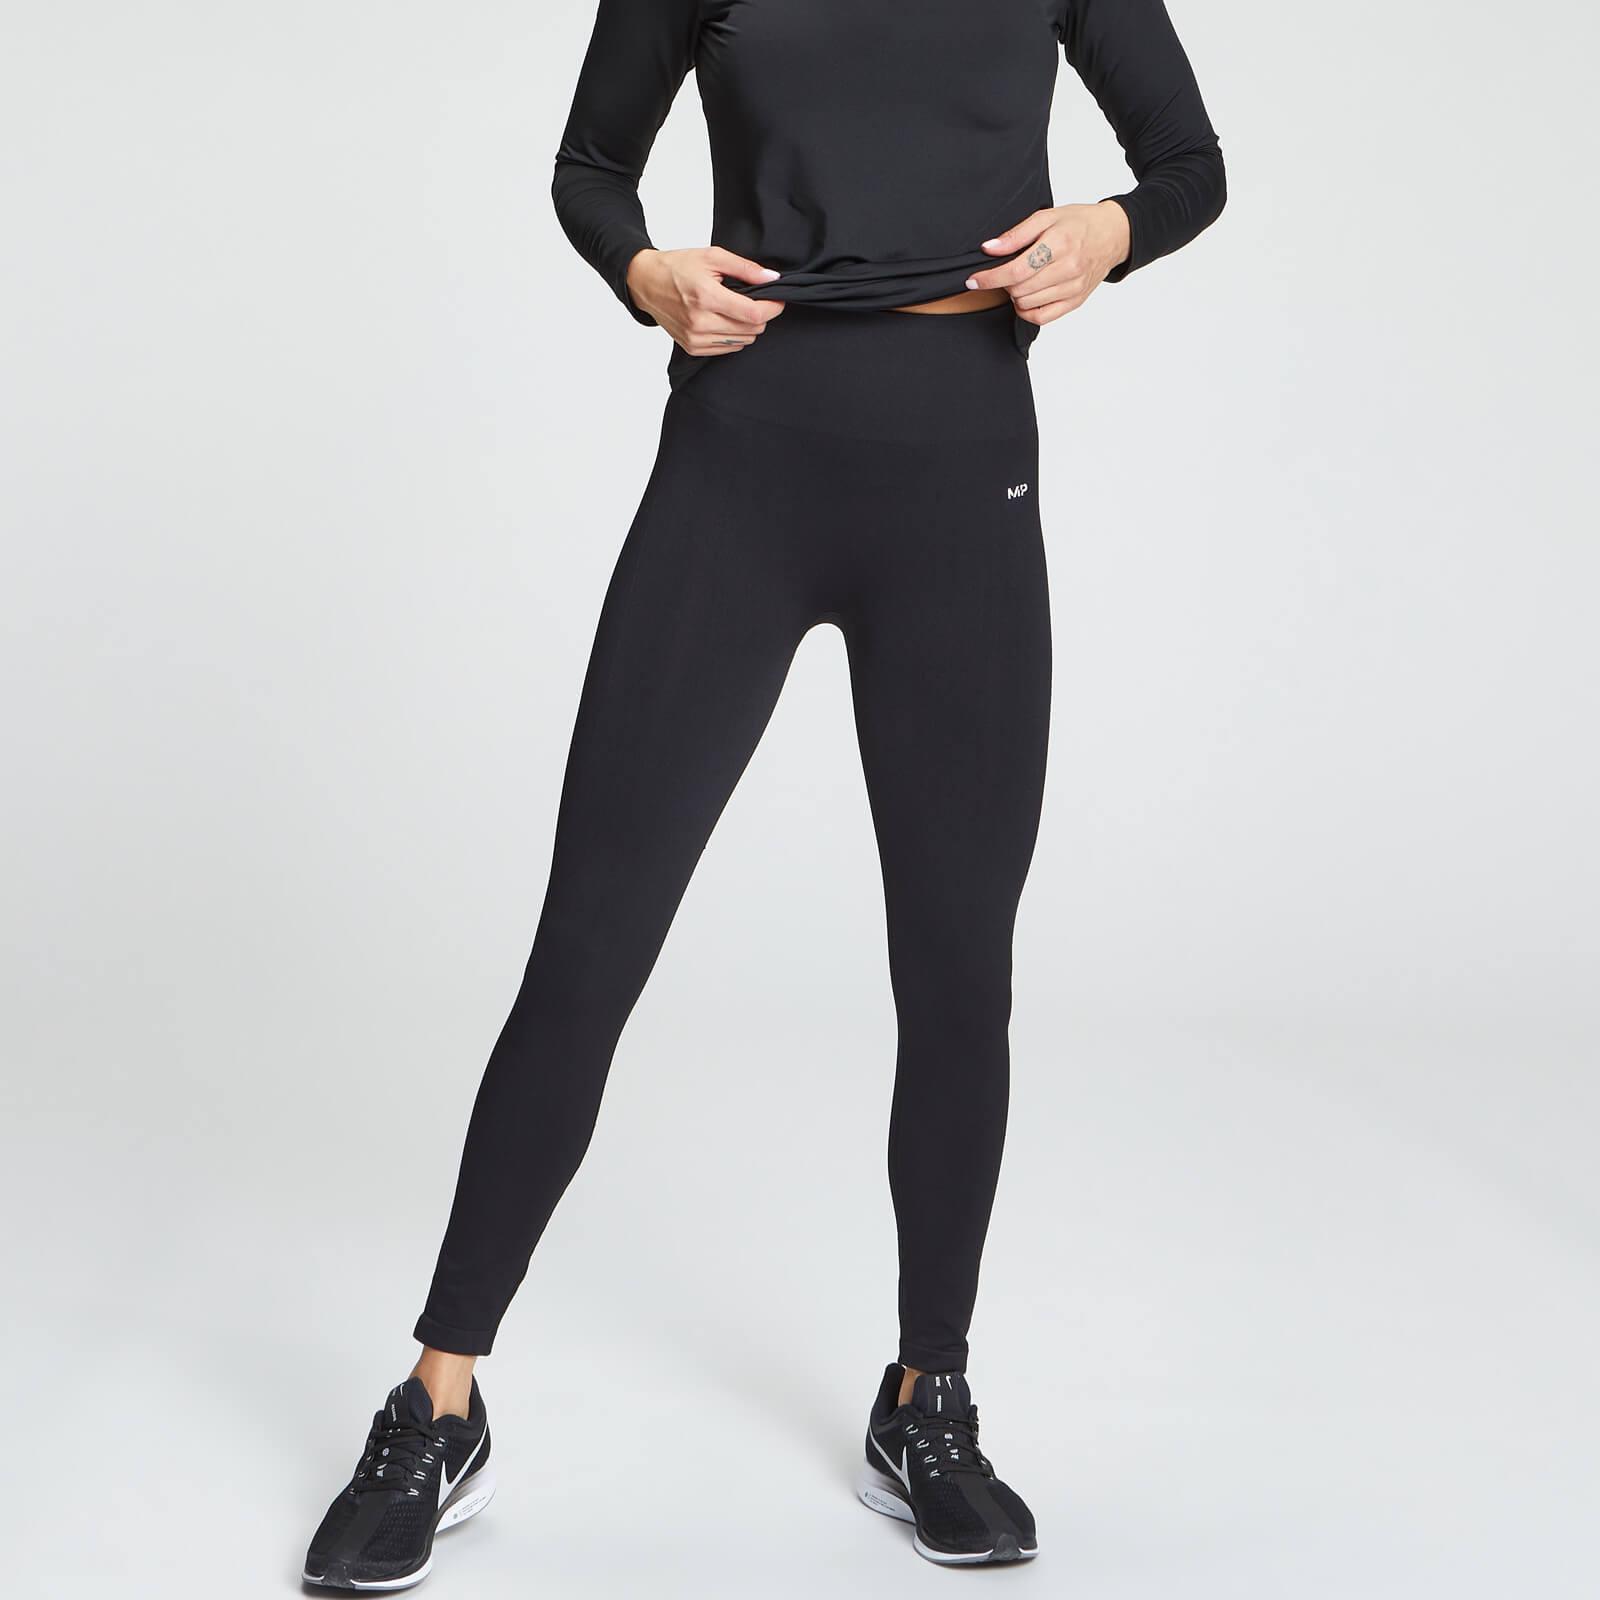 MP Women's Shape Seamless Ultra 7/8 Leggings - Black - M, Myprotein International  - купить со скидкой